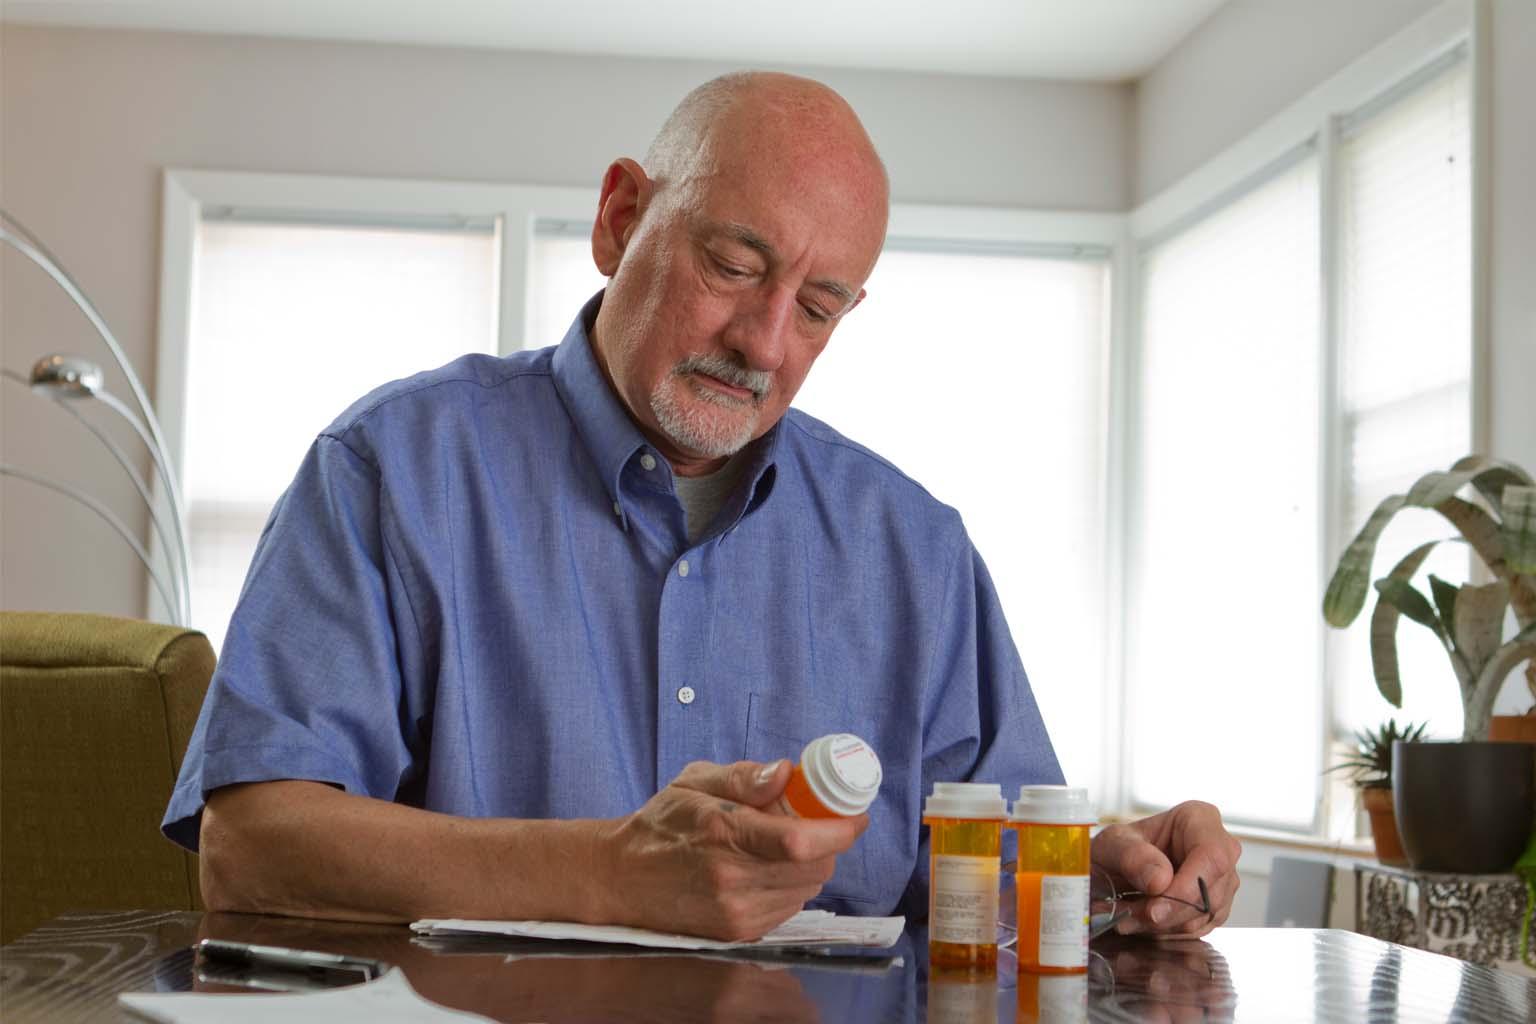 man reading label on prescription bottle